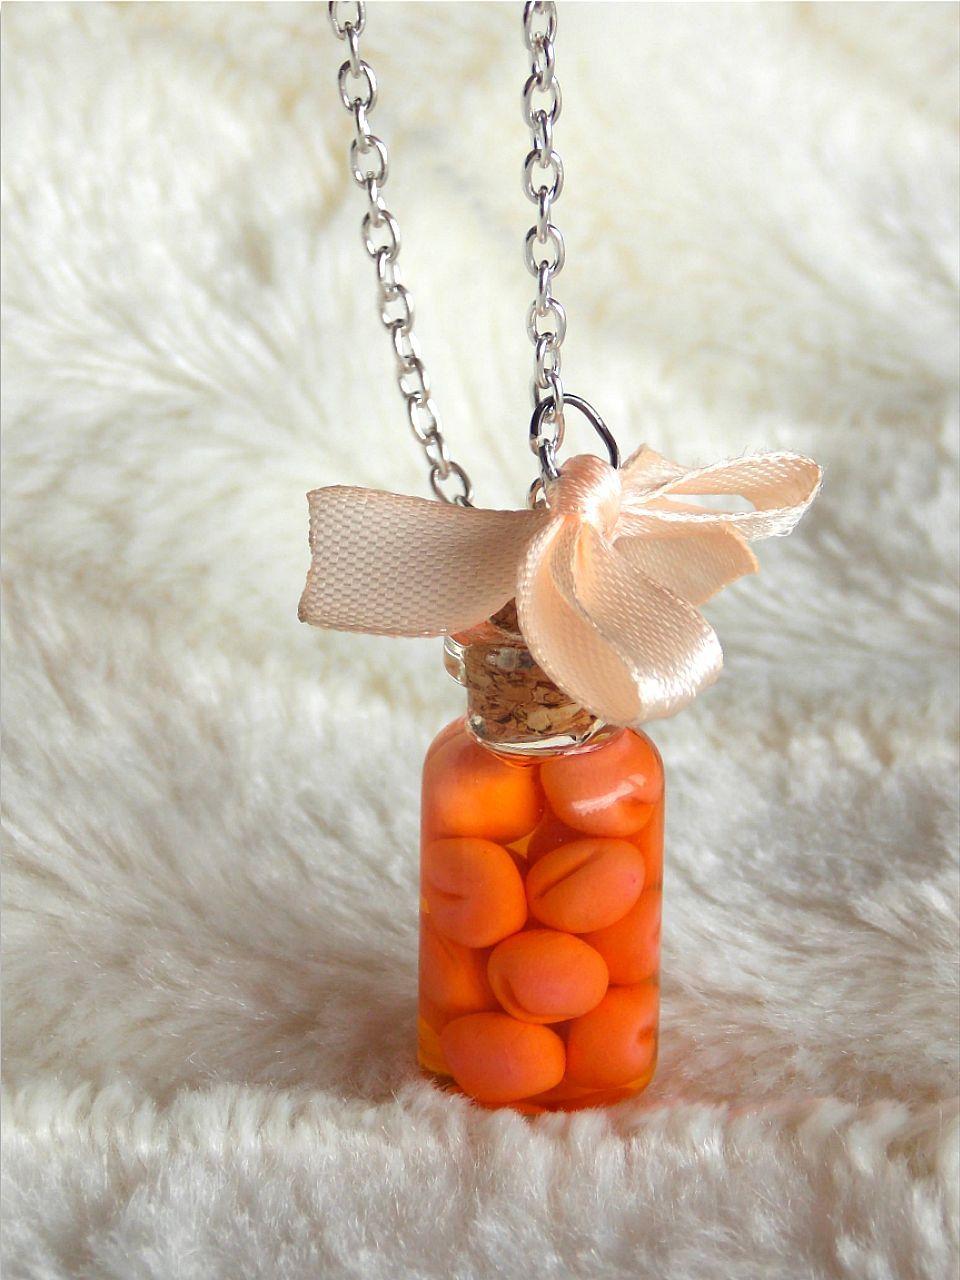 Miniature Apricot Food Necklace - Funny Necklace - Bottle Necklace ...